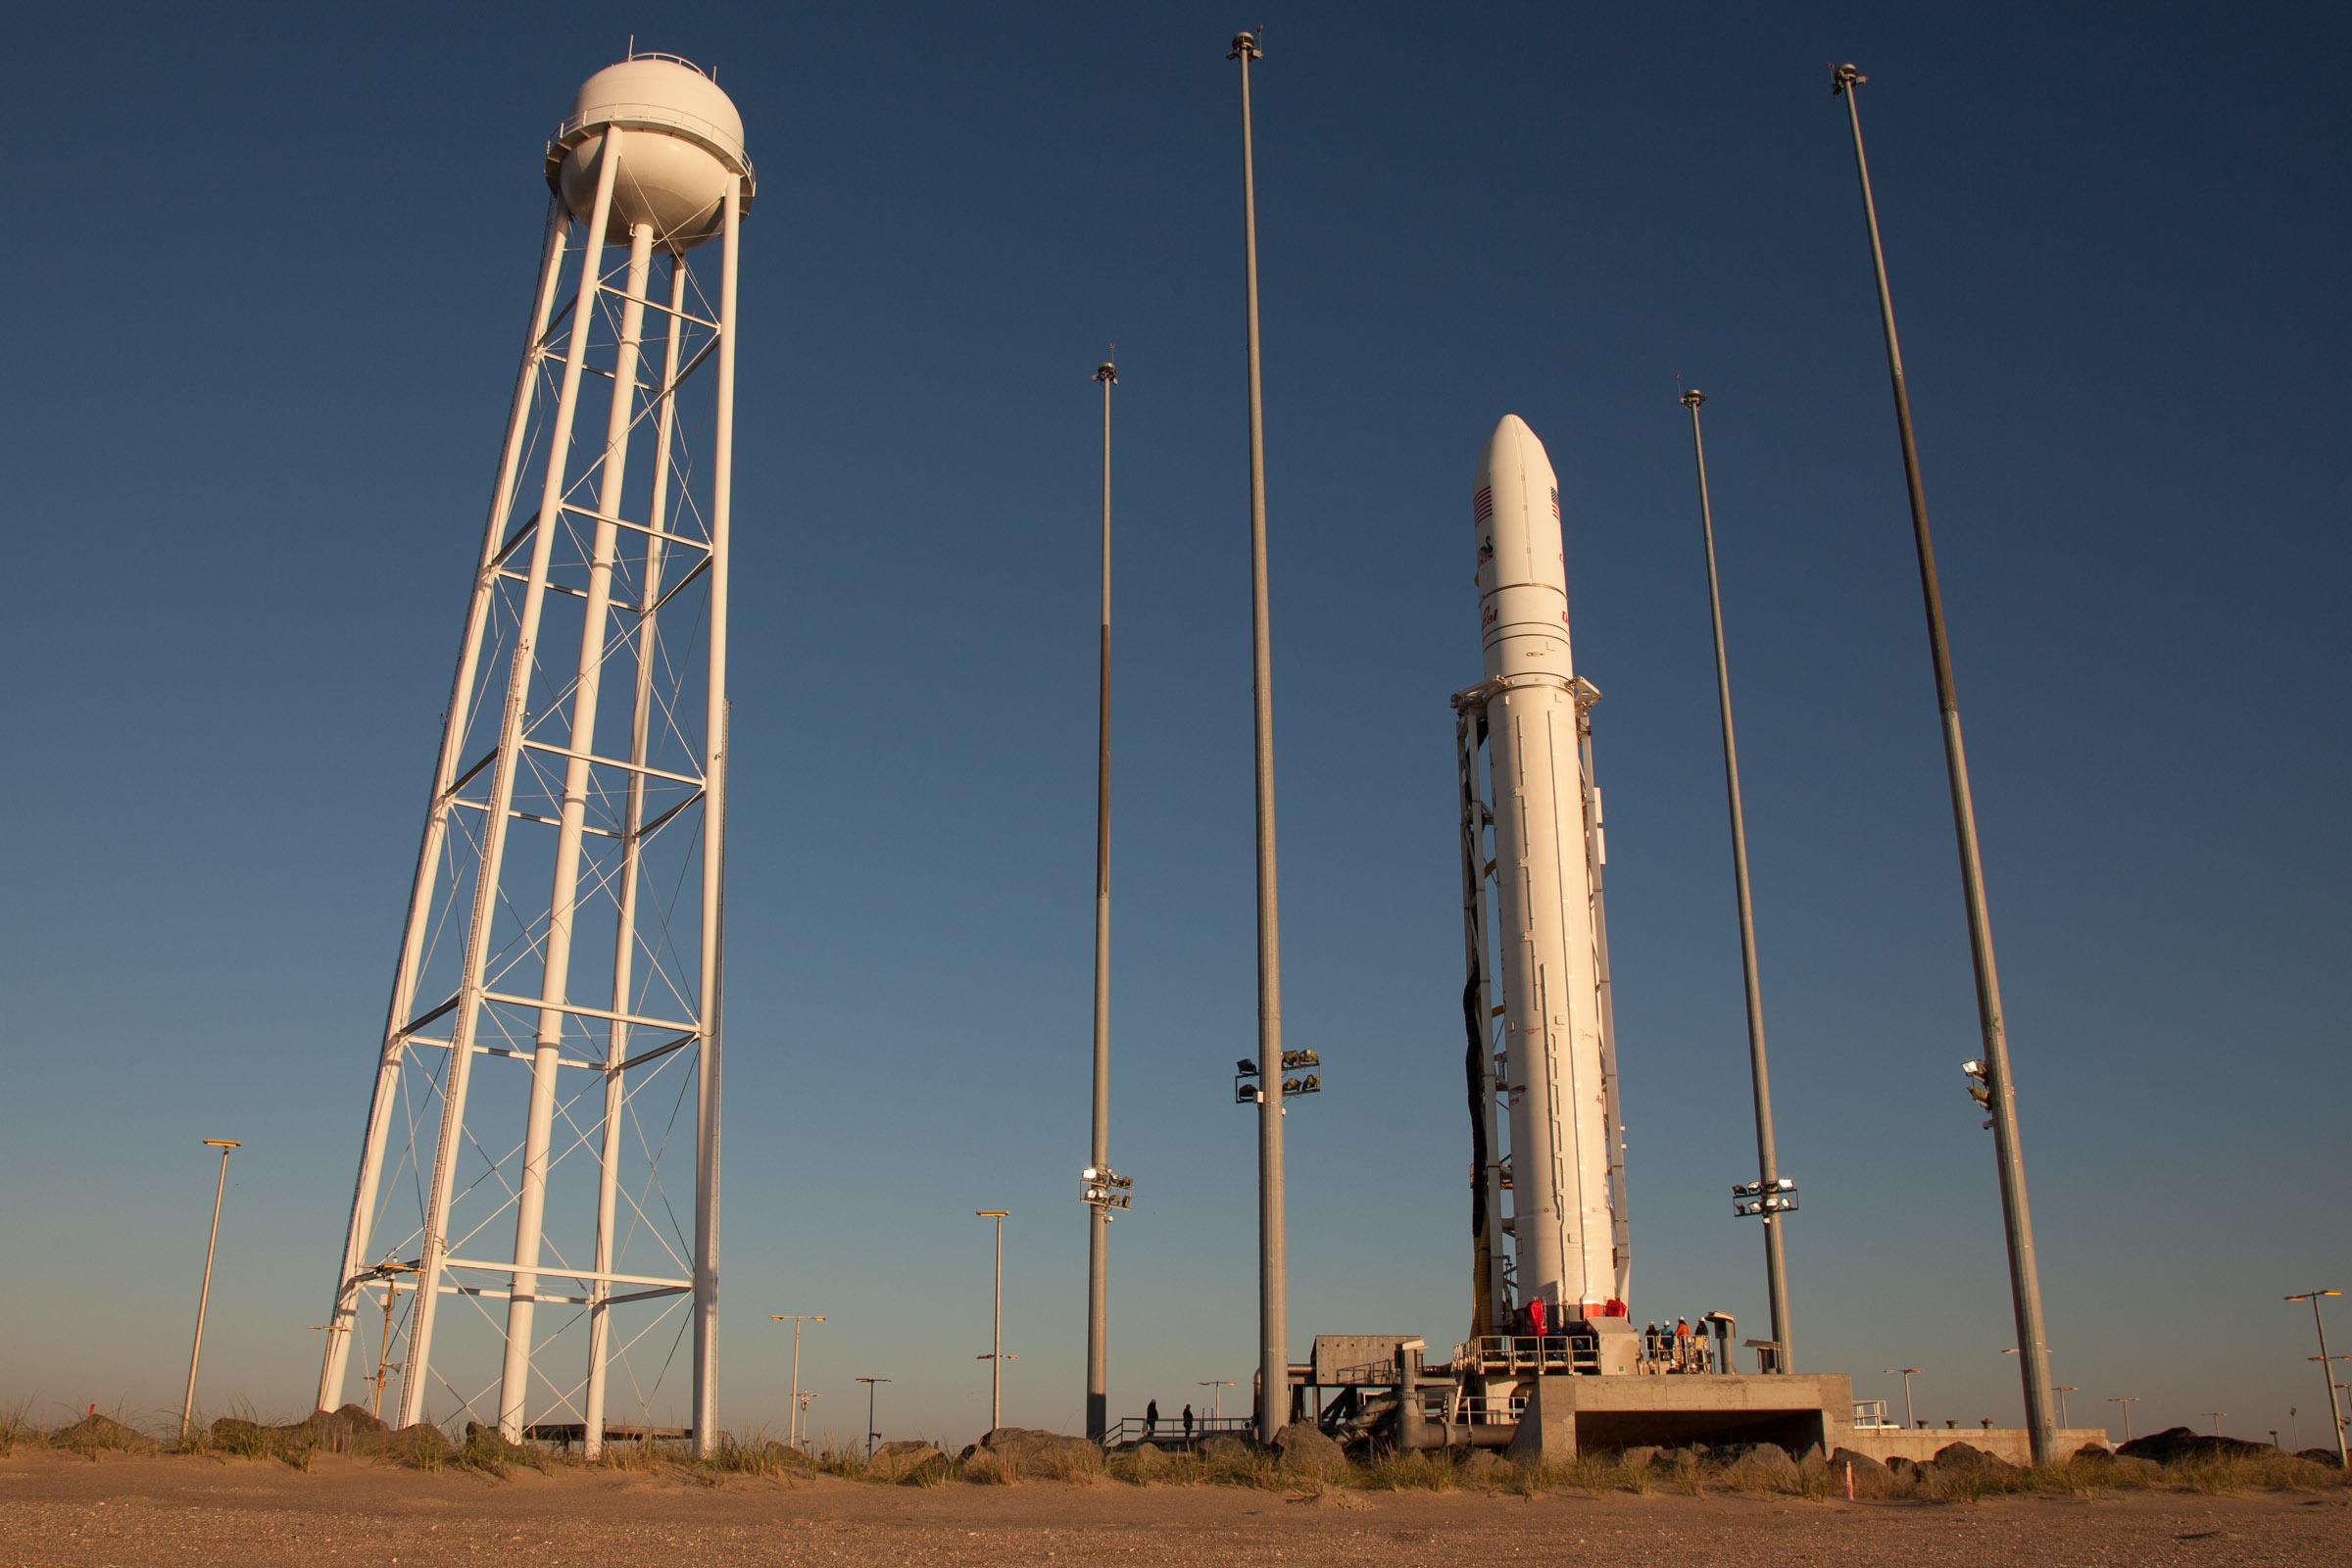 nasa wallops rocket launch - photo #36